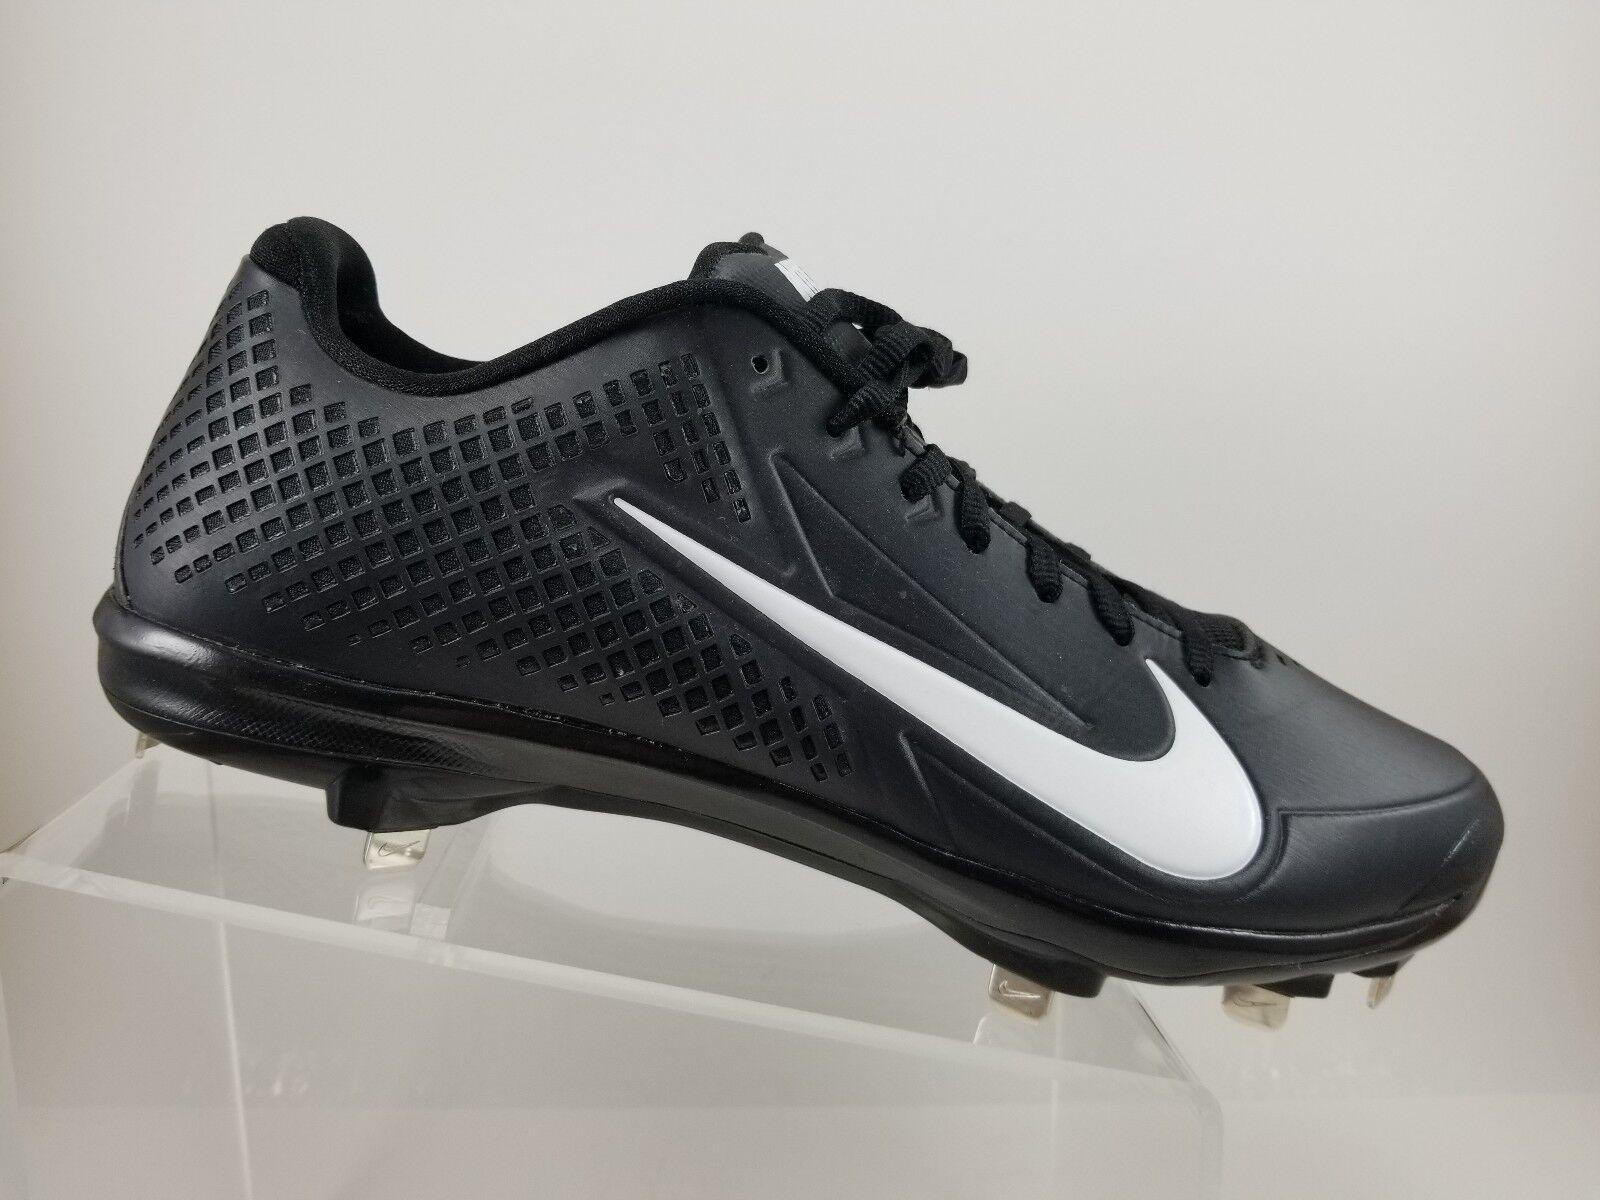 Nike Vapor Elite Black Lace Up Baseball Cleats shoes Mens 12M 538533-010